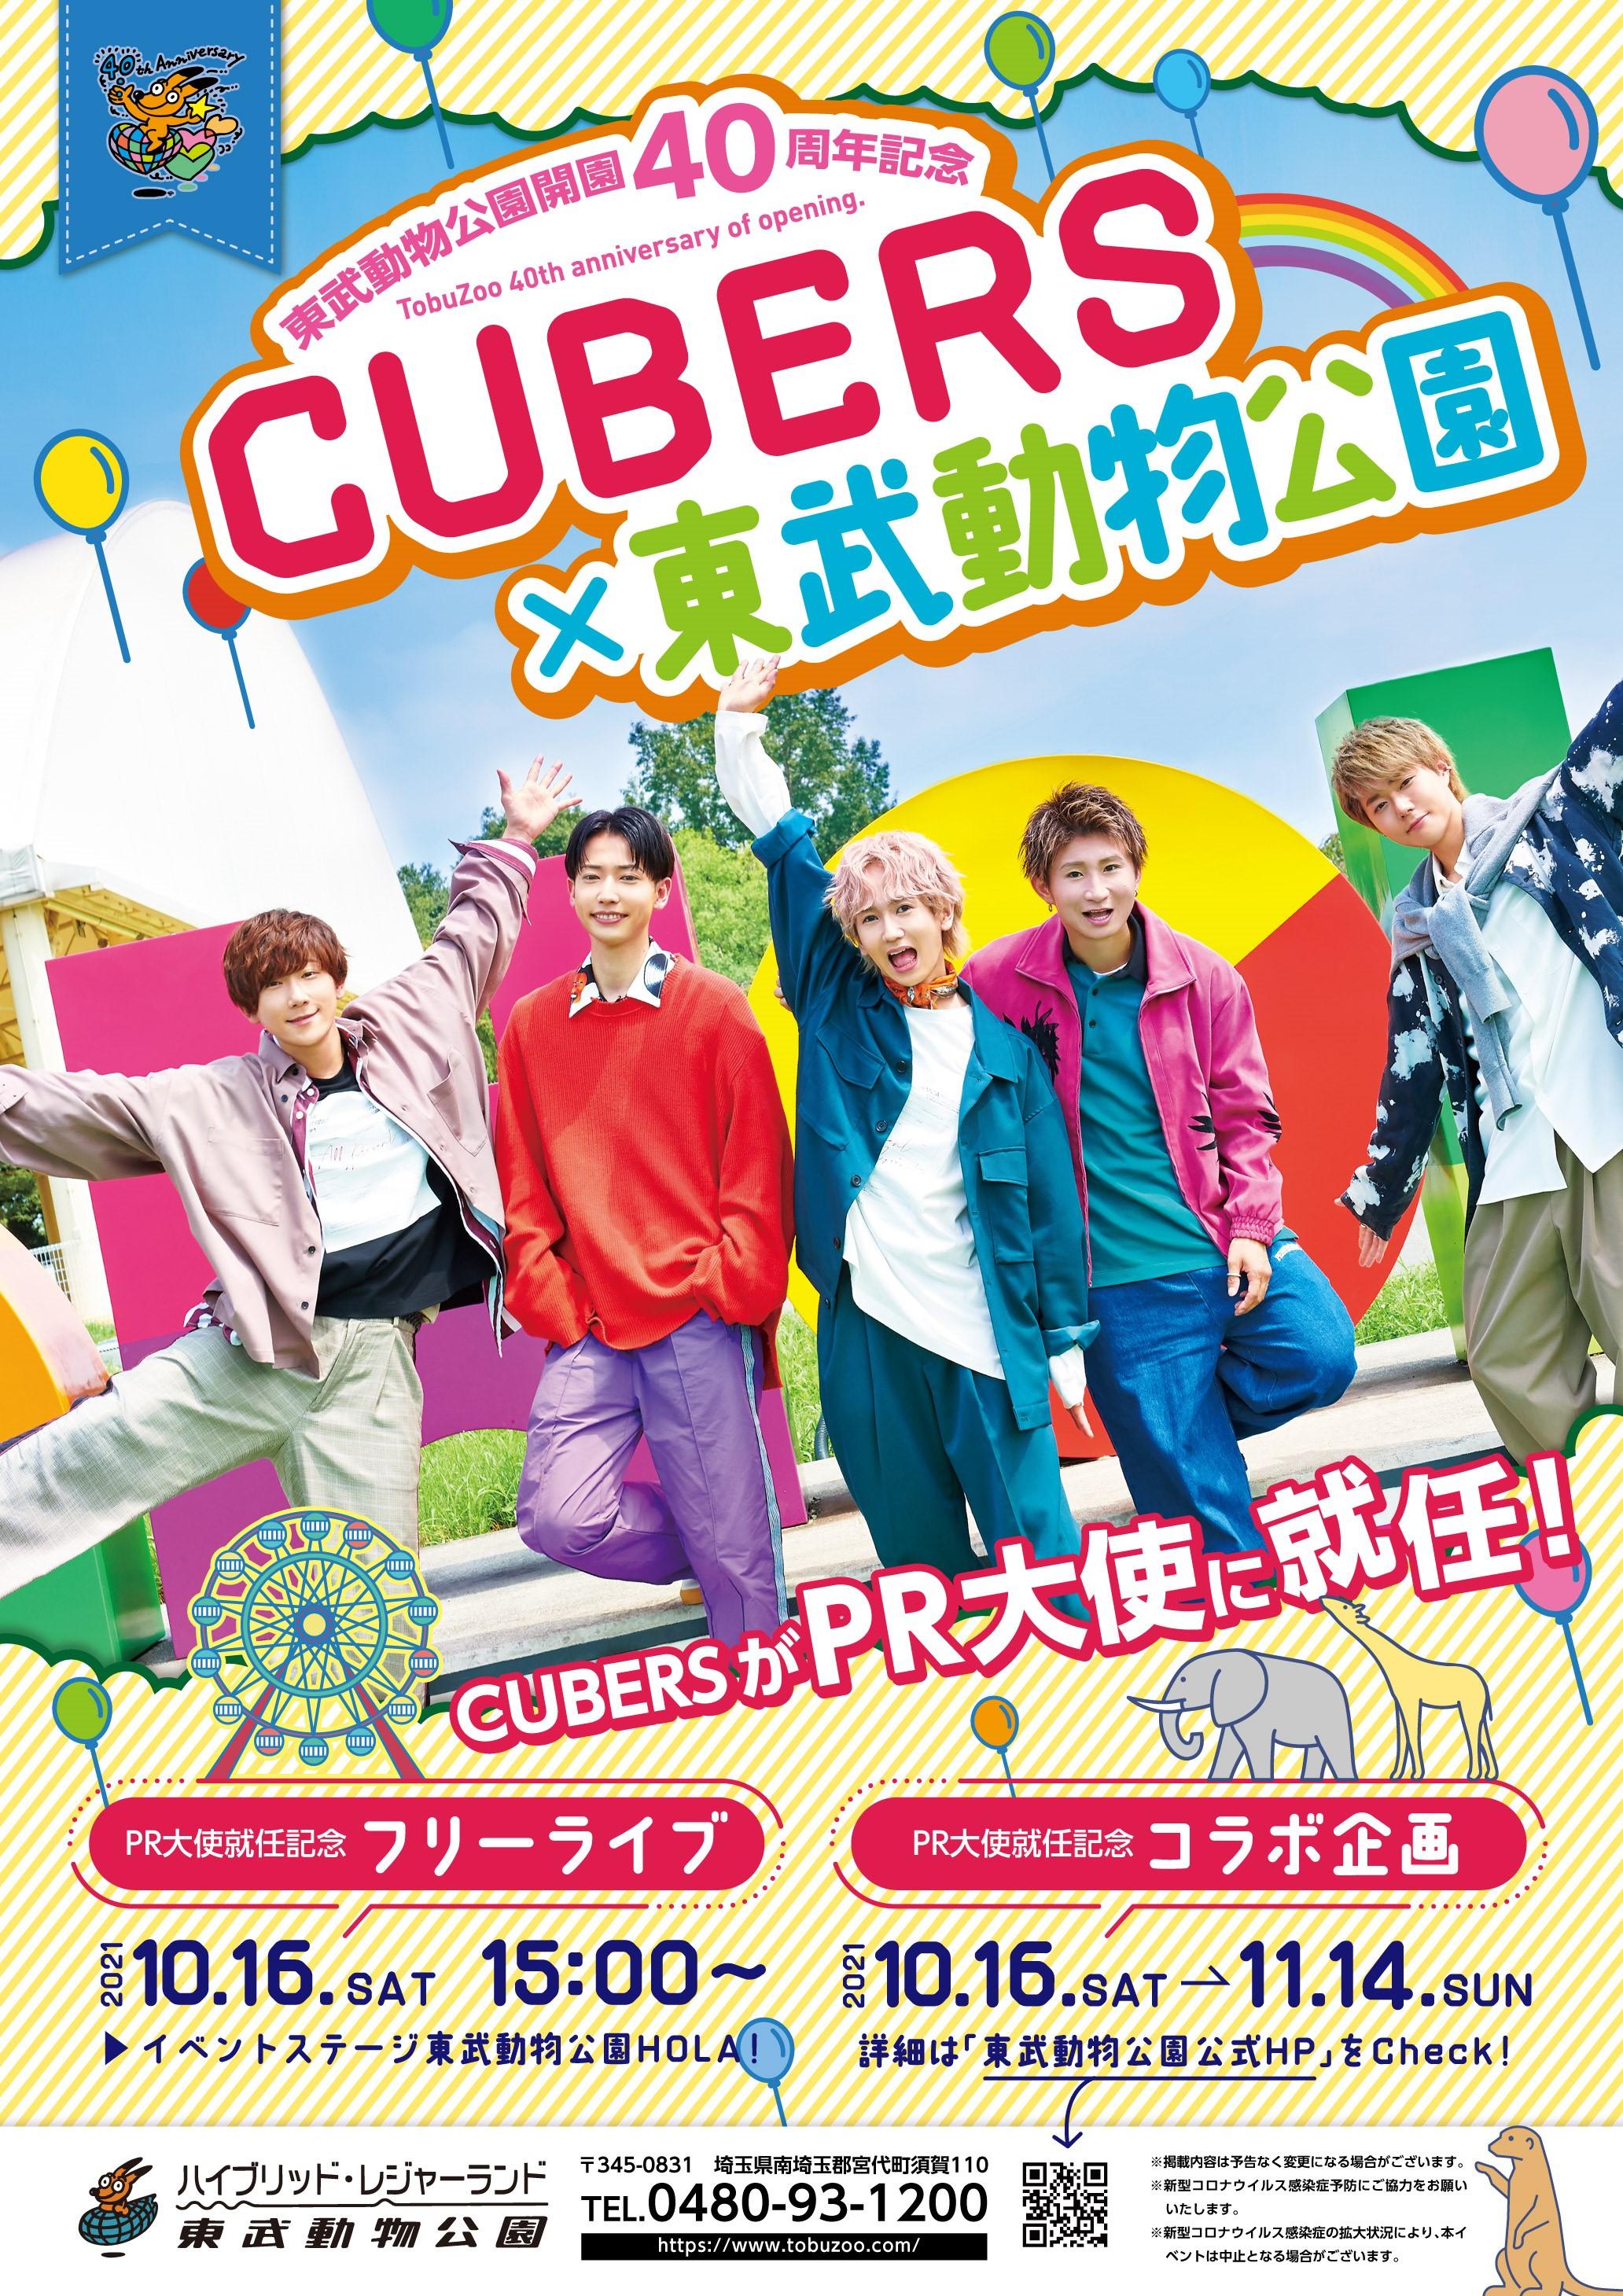 ★☆CUBERSが東武動物公園 開園40周年記念のPR大使に就任決定!★☆